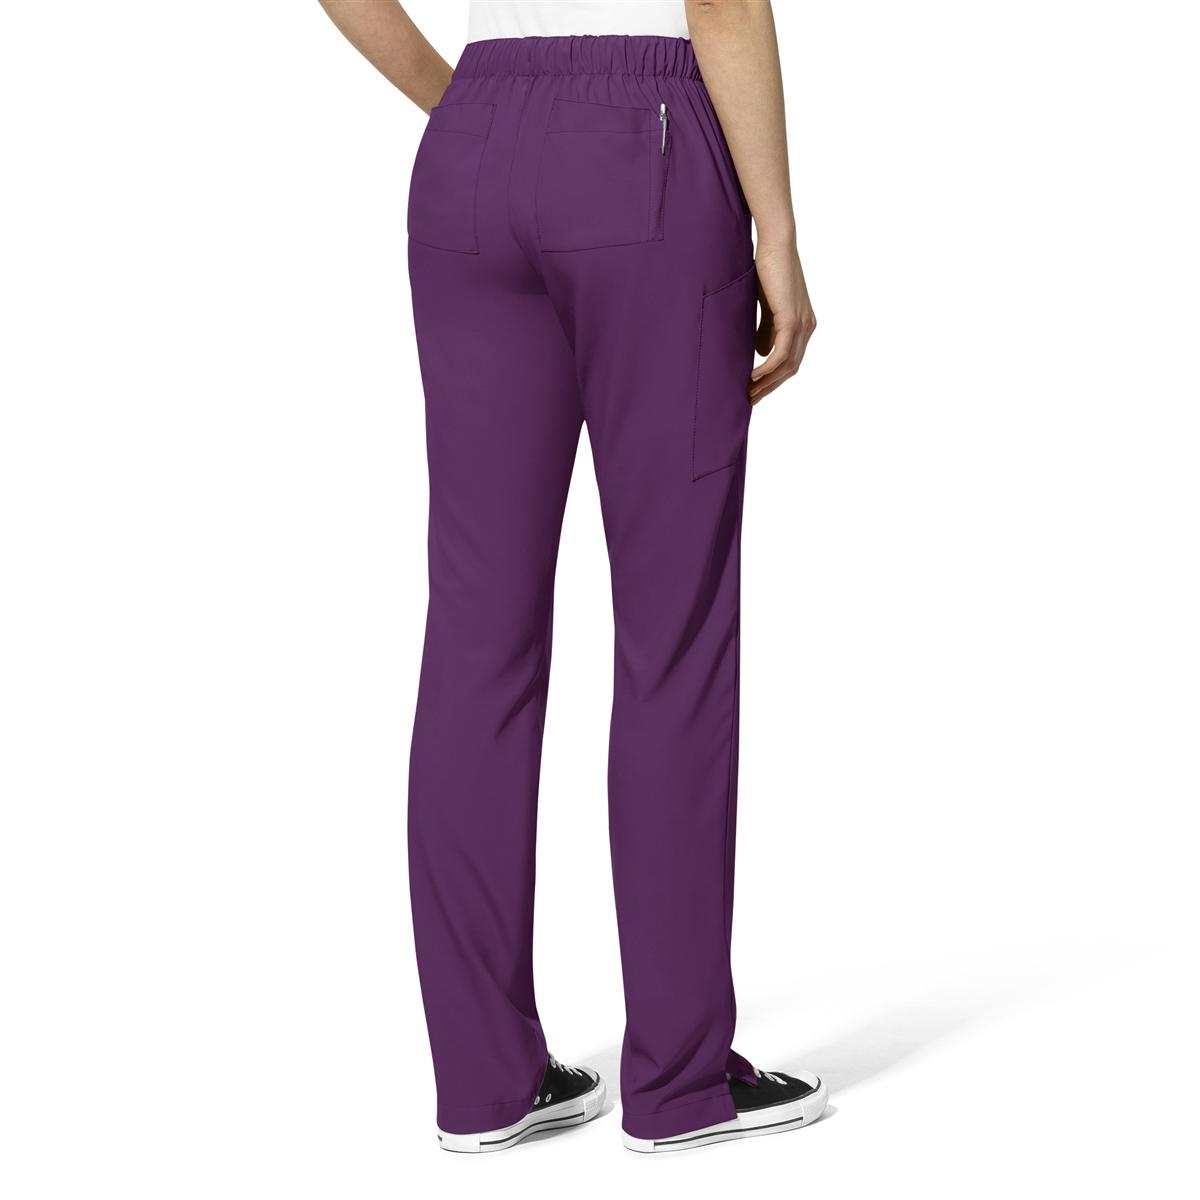 WonderWink Scrubs Set W123 Women/'s Women/'s V-Neck Top /& Cargo Pant 6455//5155